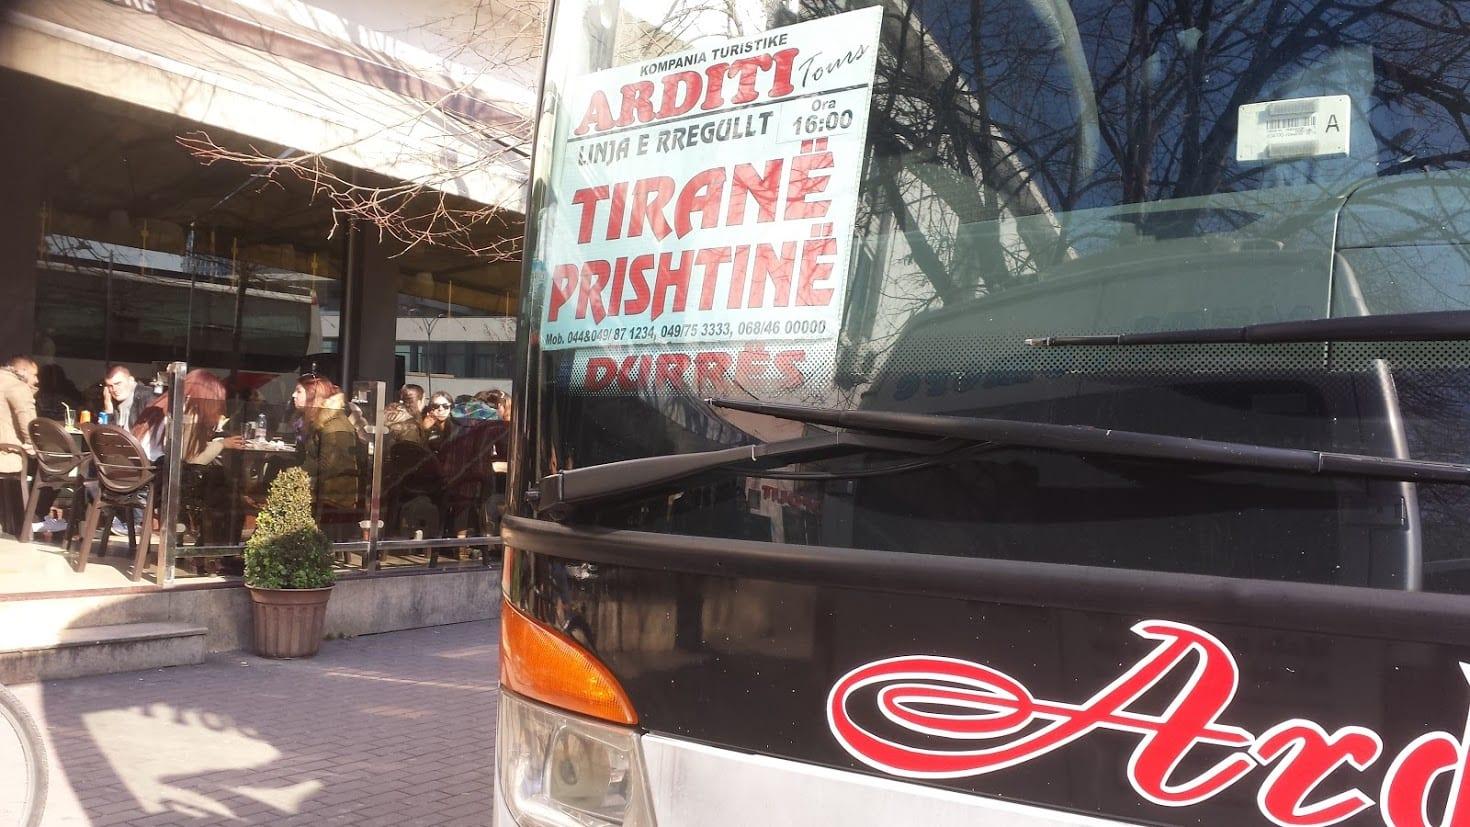 Taking the Tirana to Pristina bus